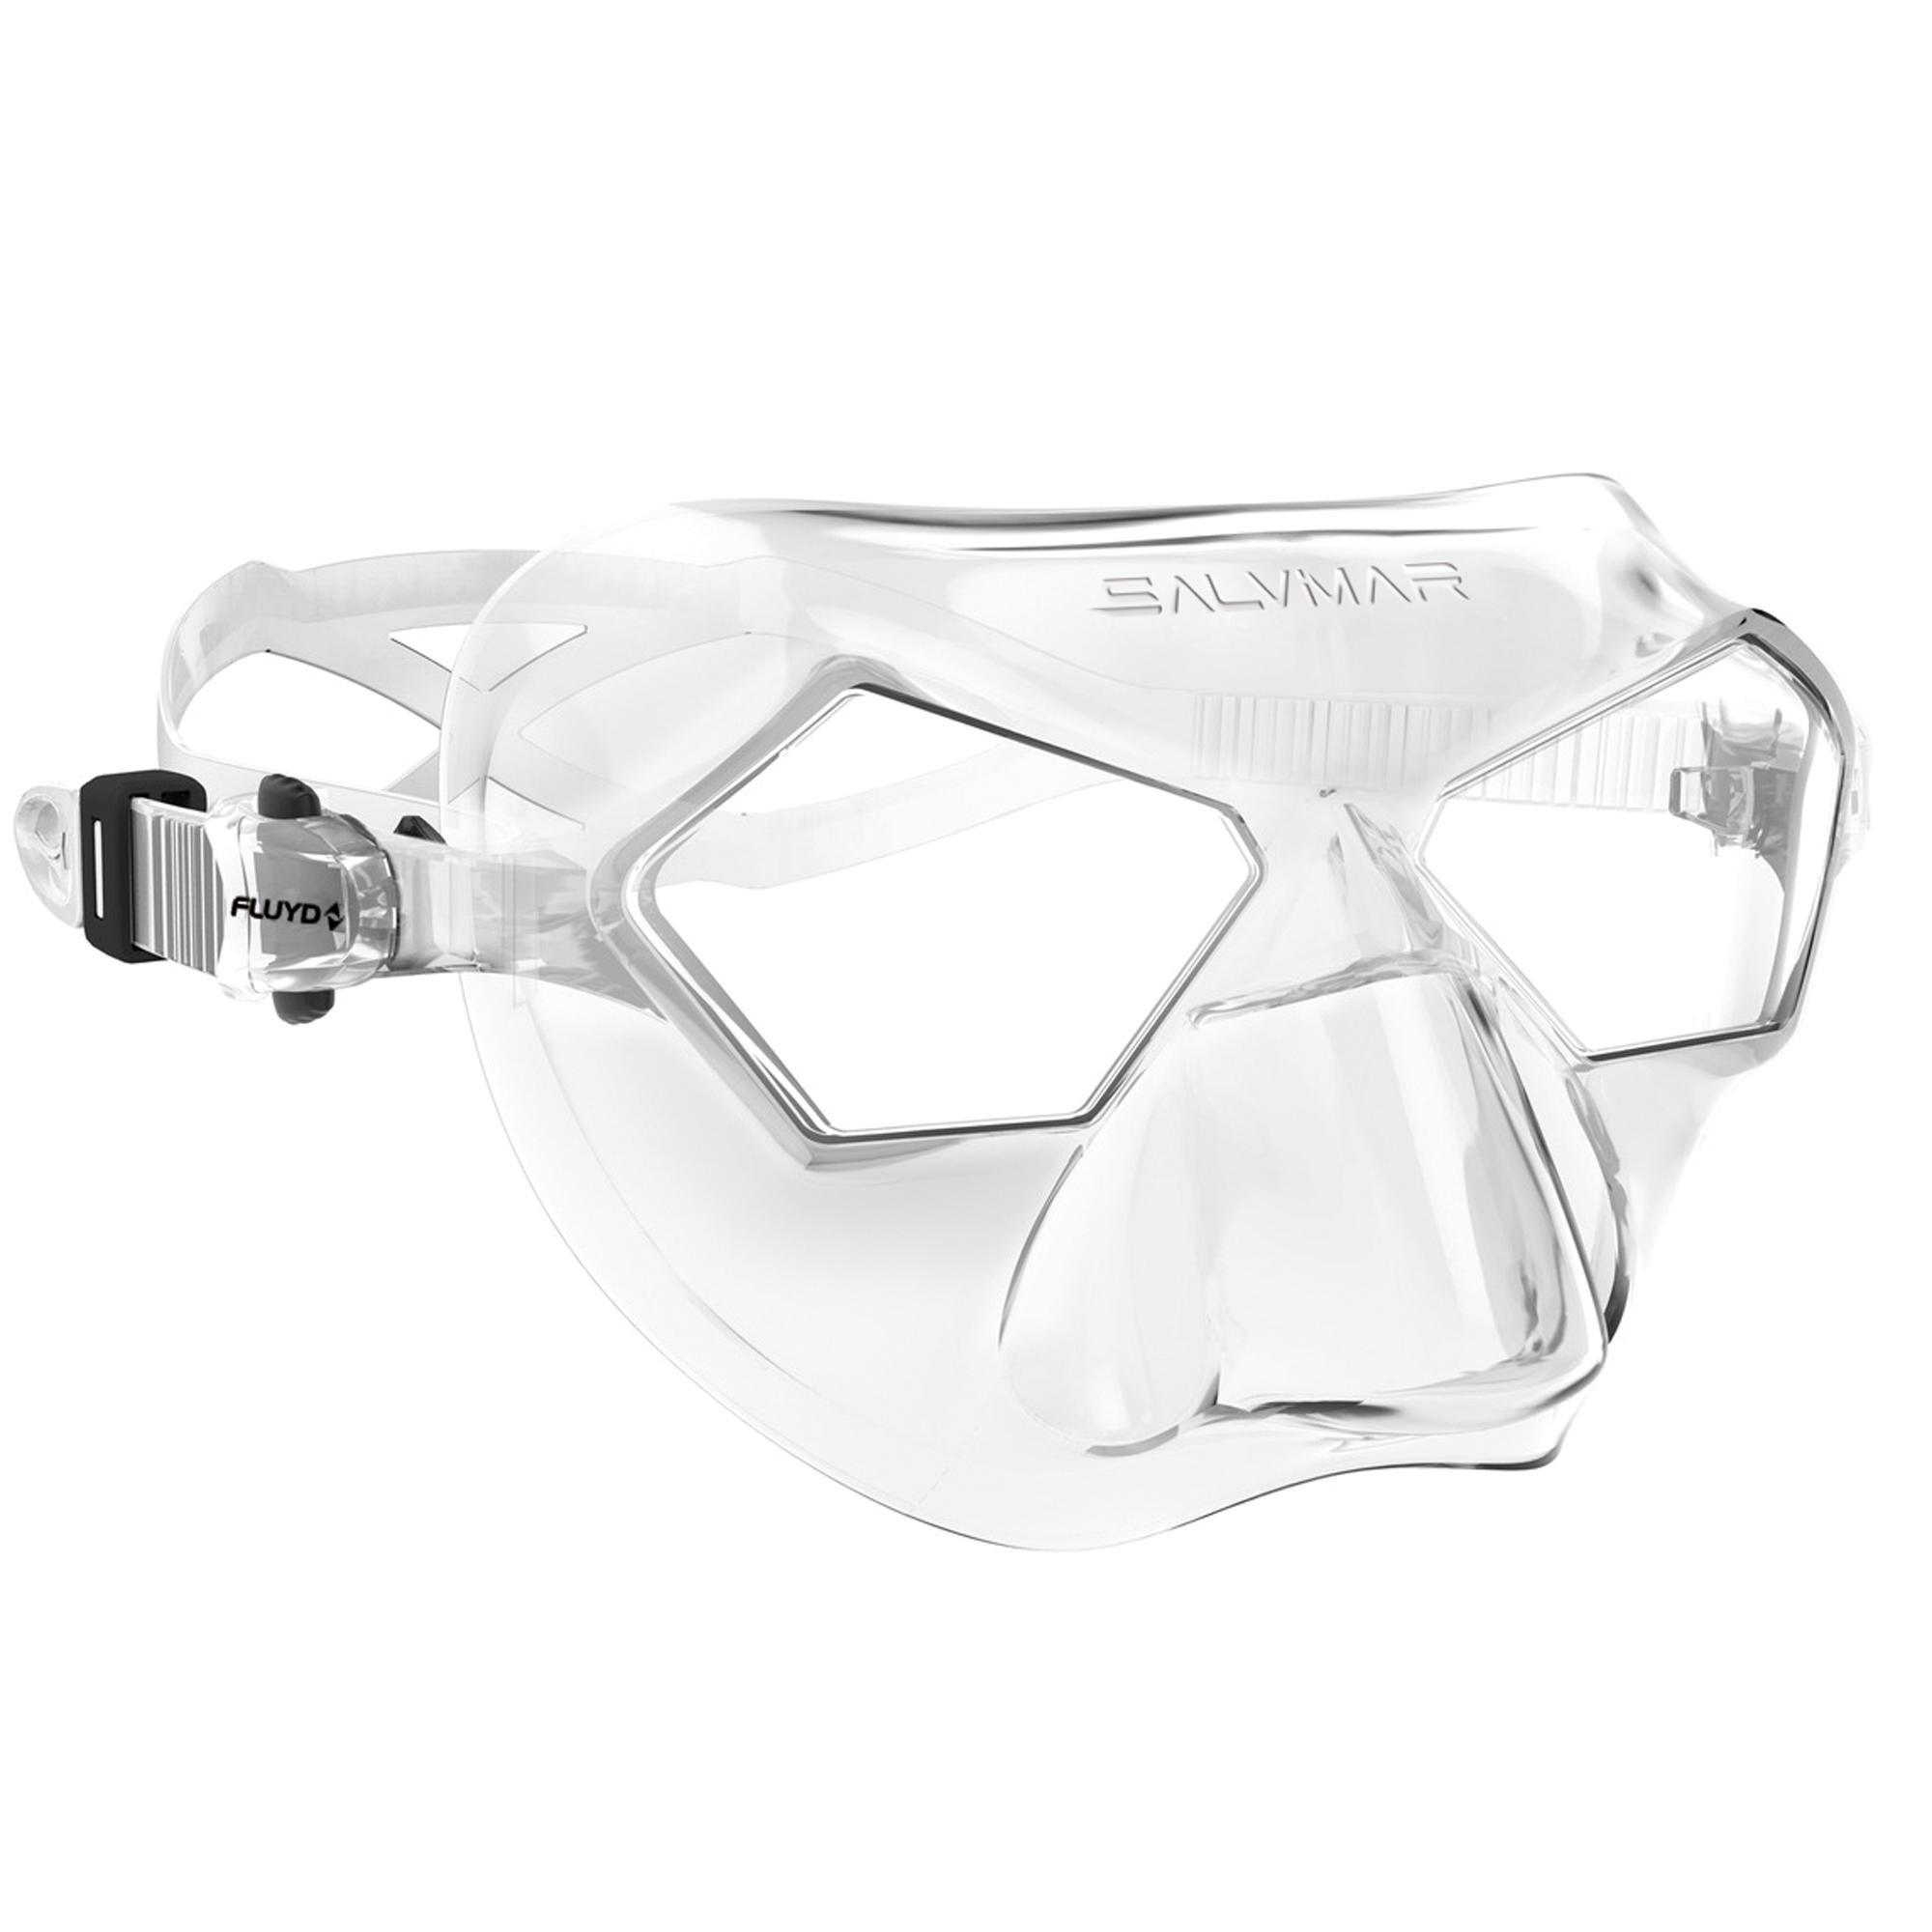 salvimar maschera apnea/pesca subacquea incredibile trasparente